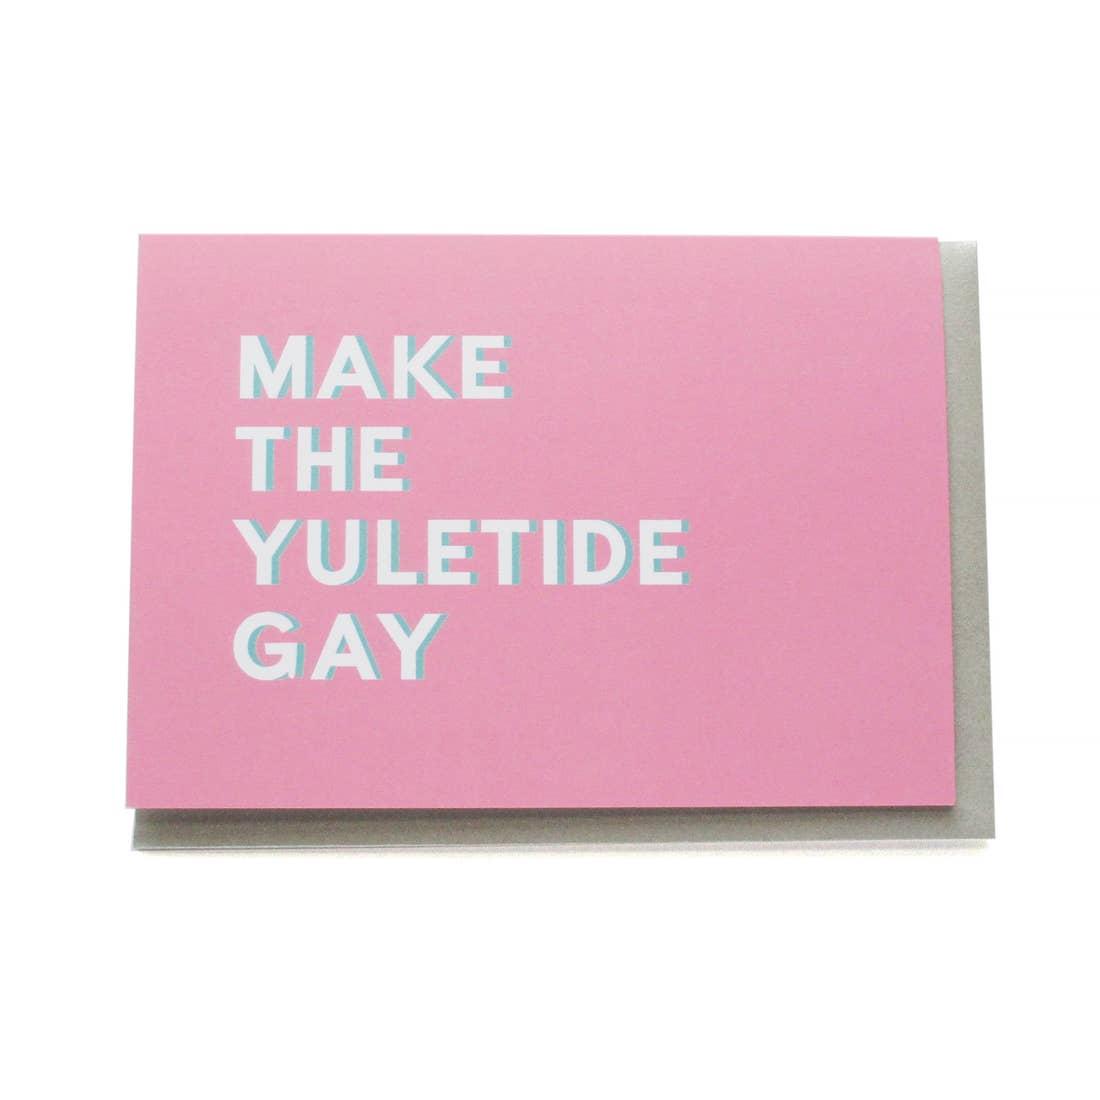 Make the Yuletide Gay Card